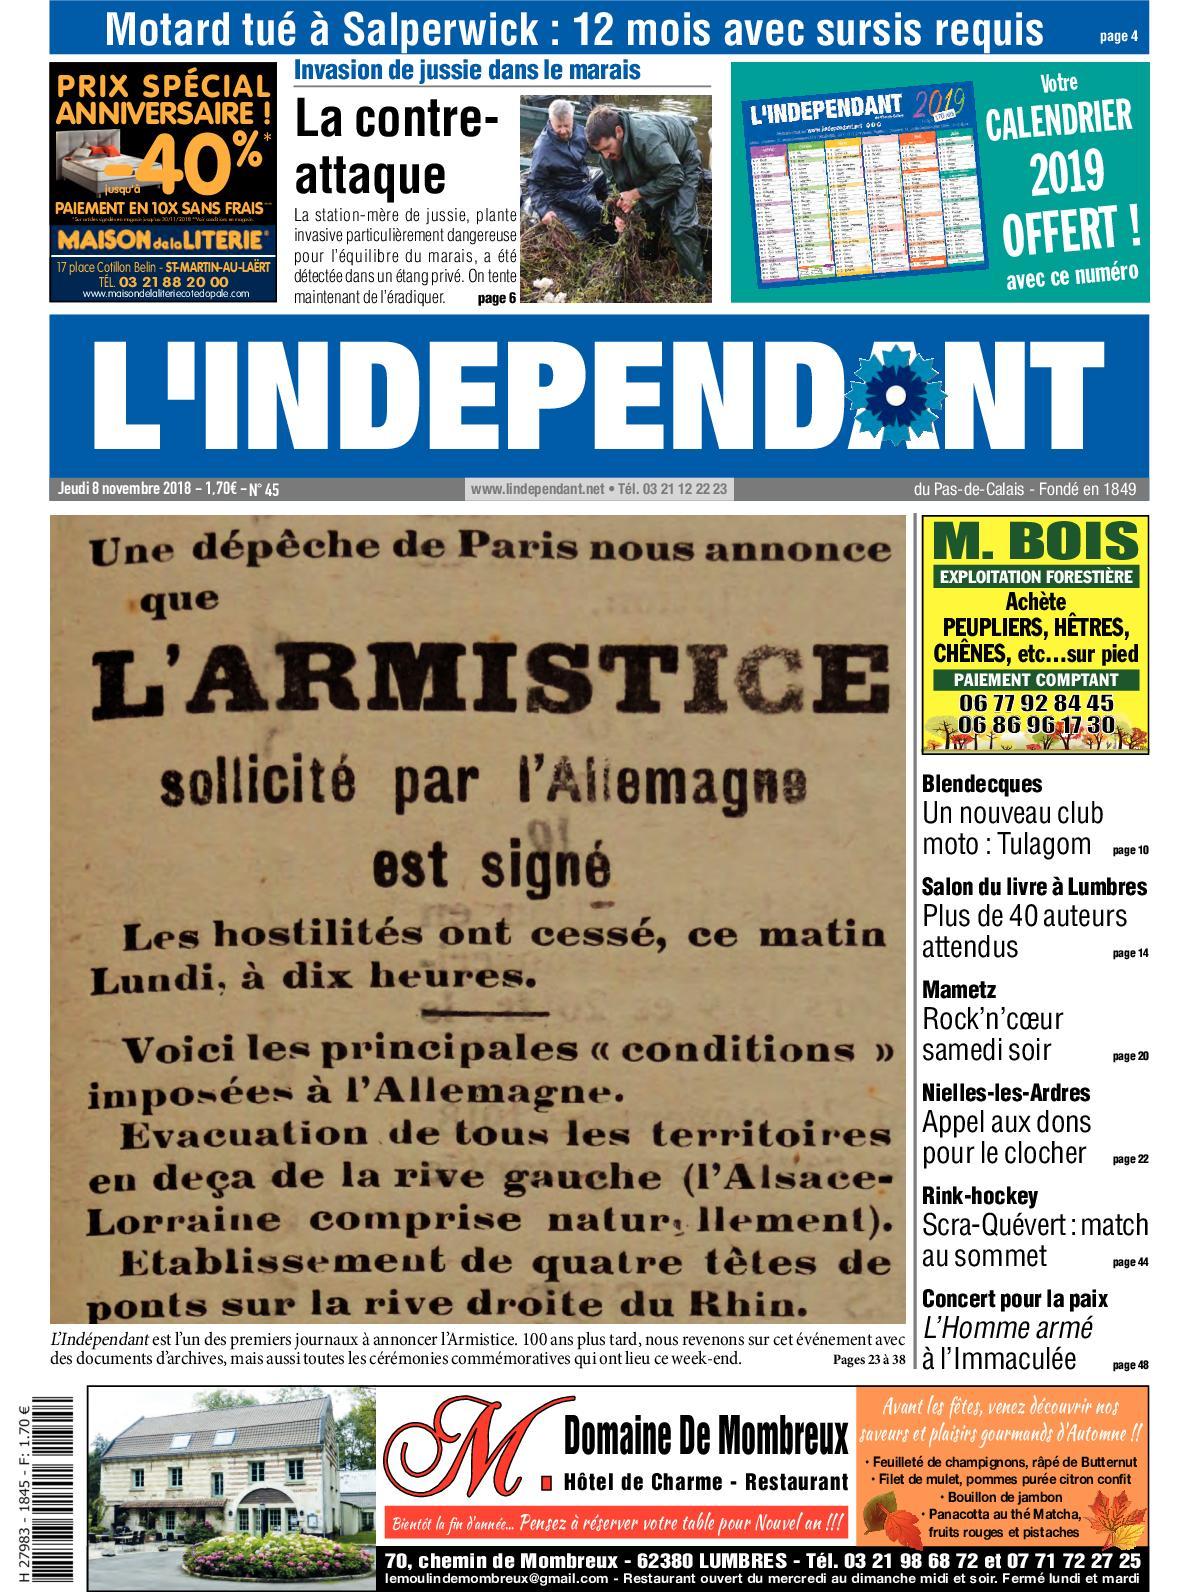 57bc3159e42f2 Calaméo - L indépendant Semaine 45 2018